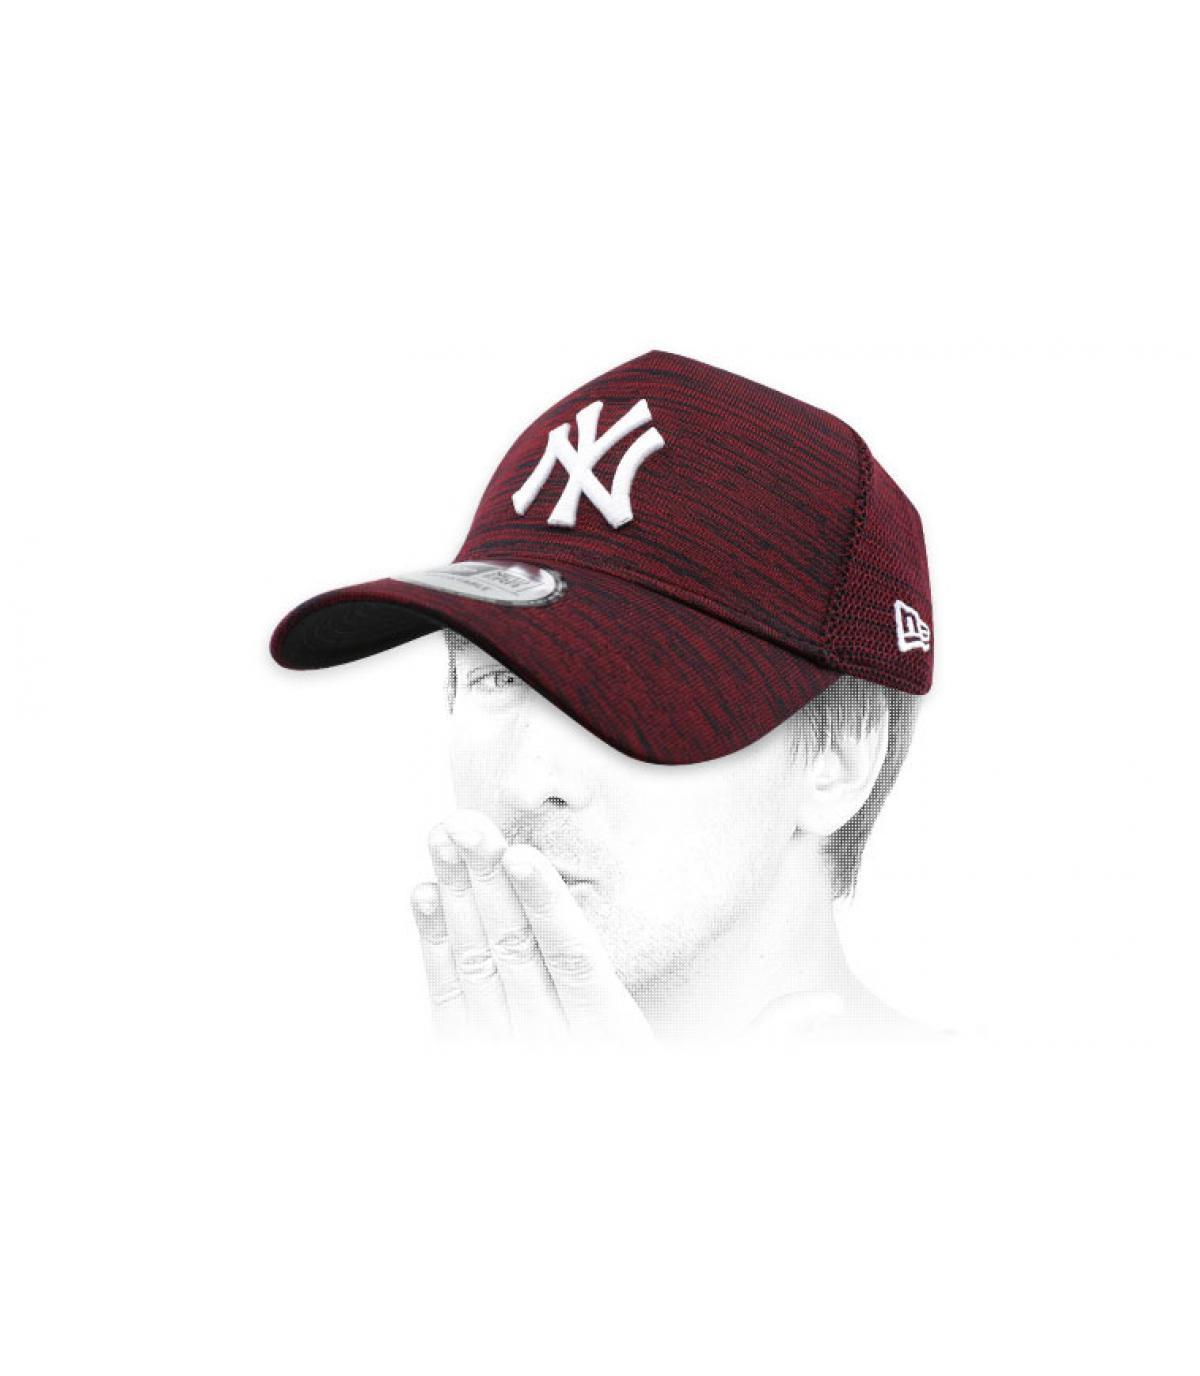 heather burgundy NY cap